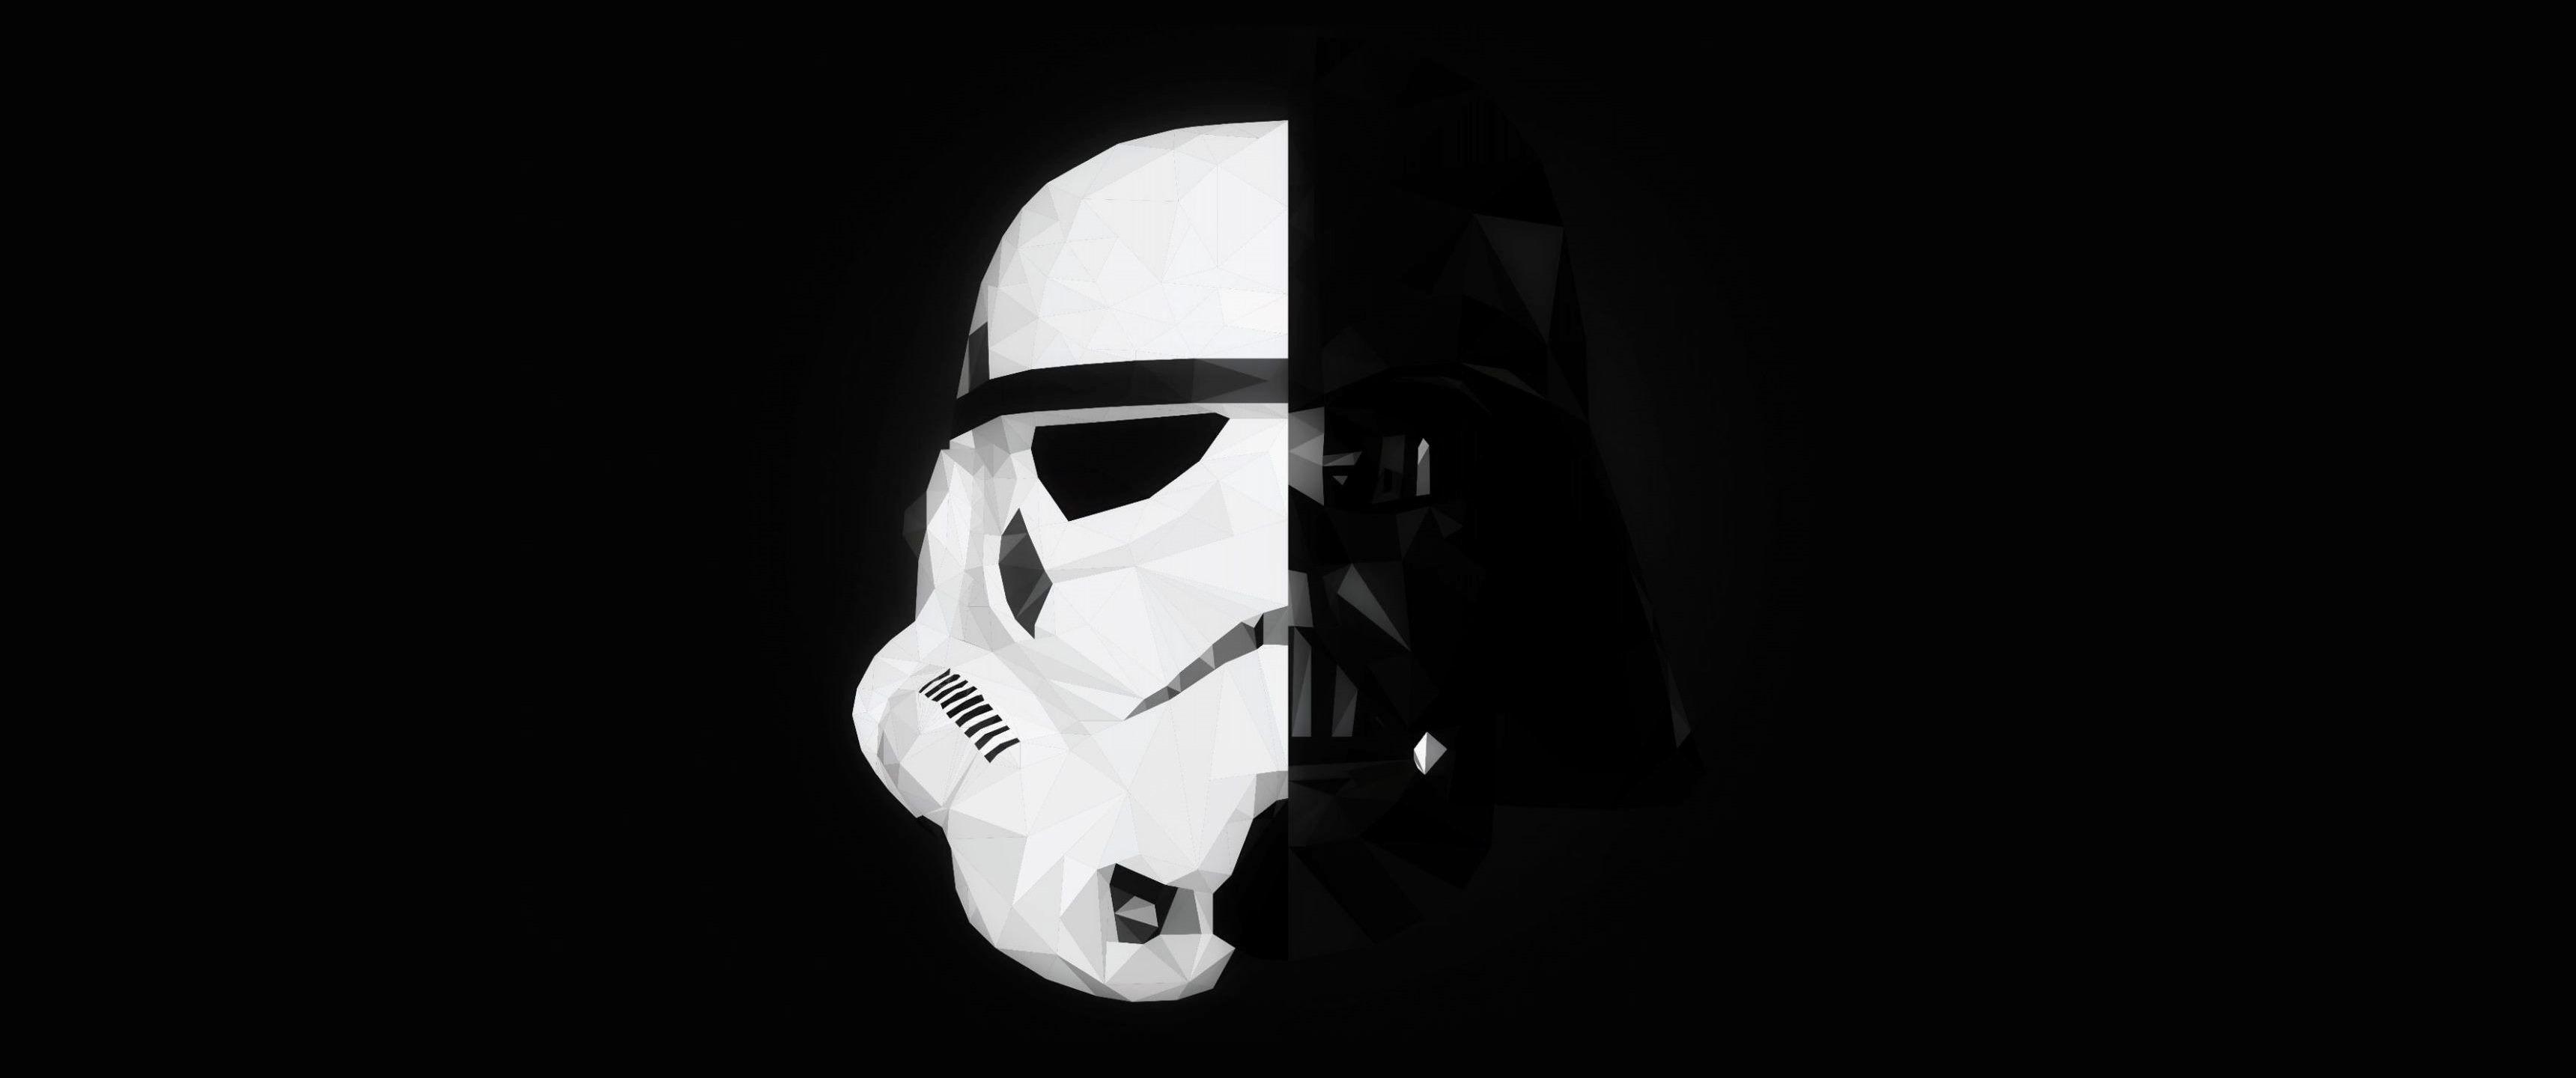 122 Hd Stormtrooper